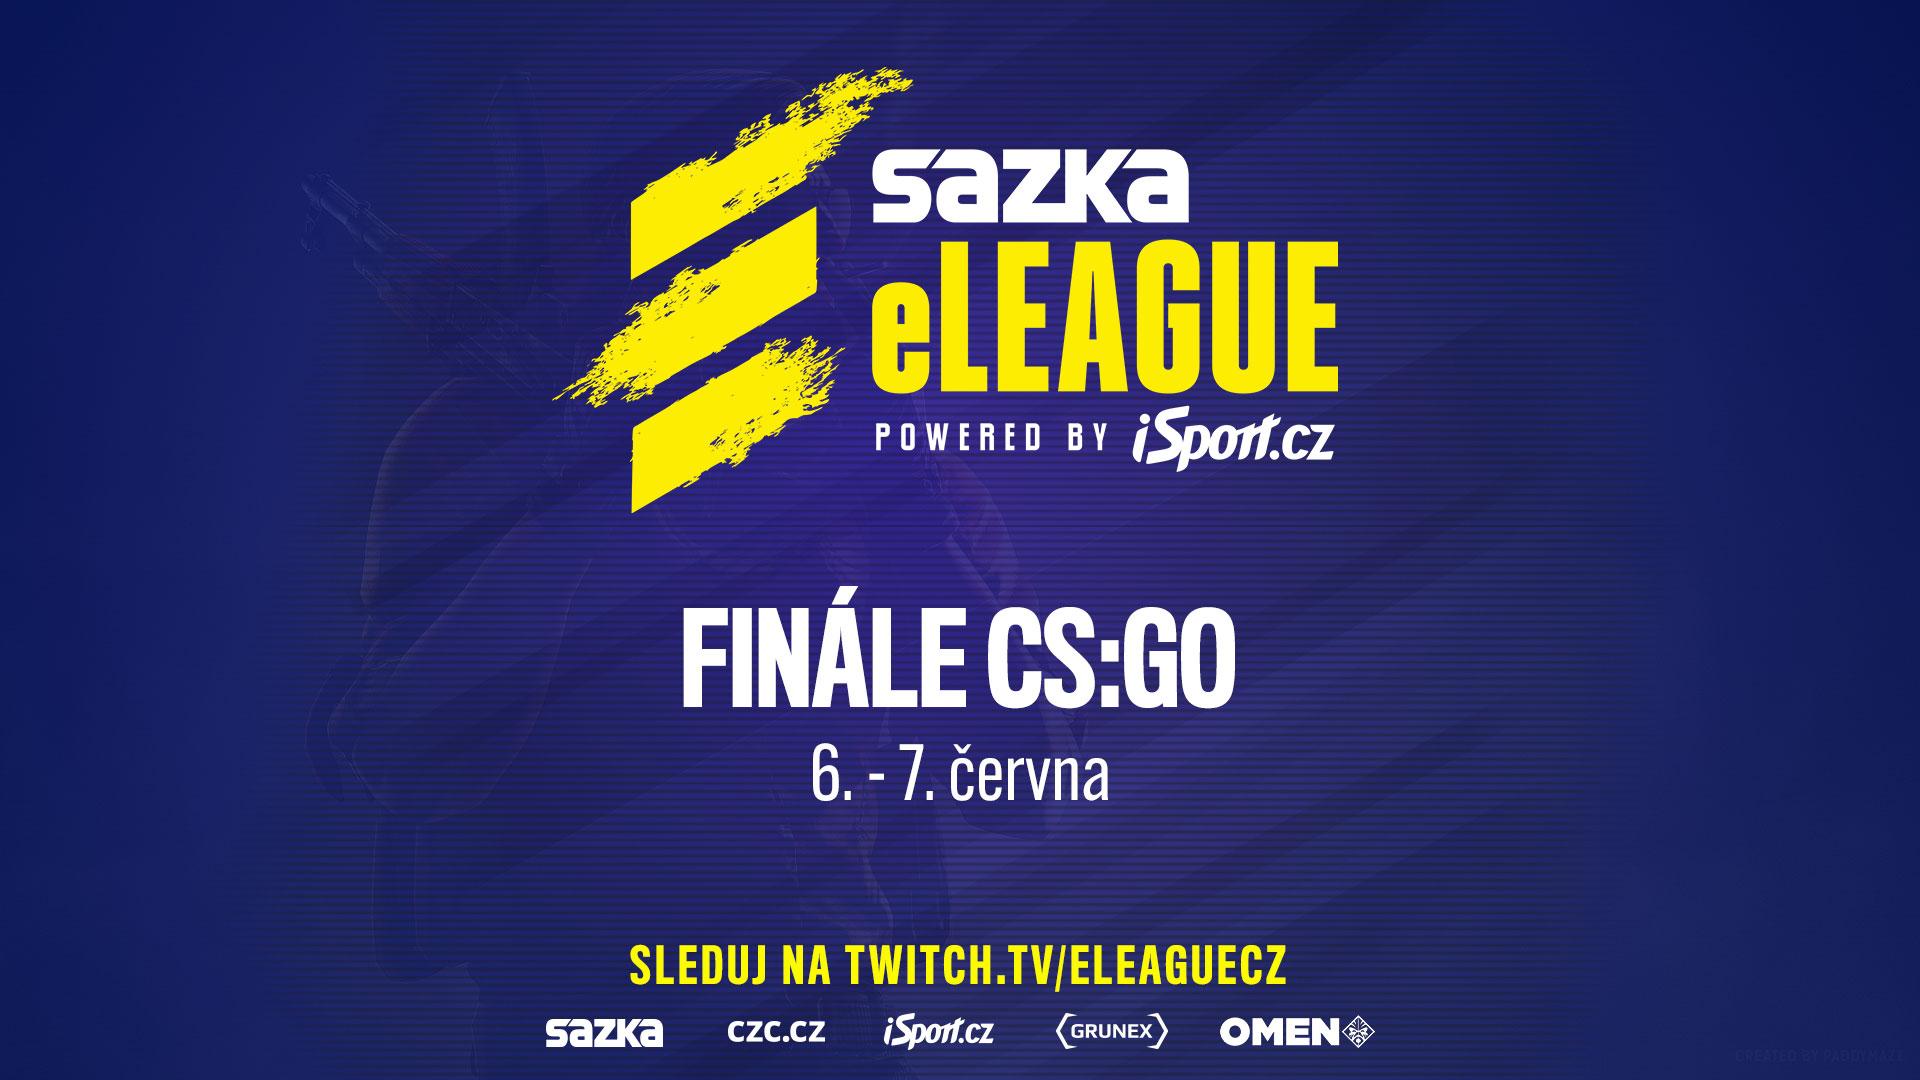 sazka-eleague_playoff_ilustrace1